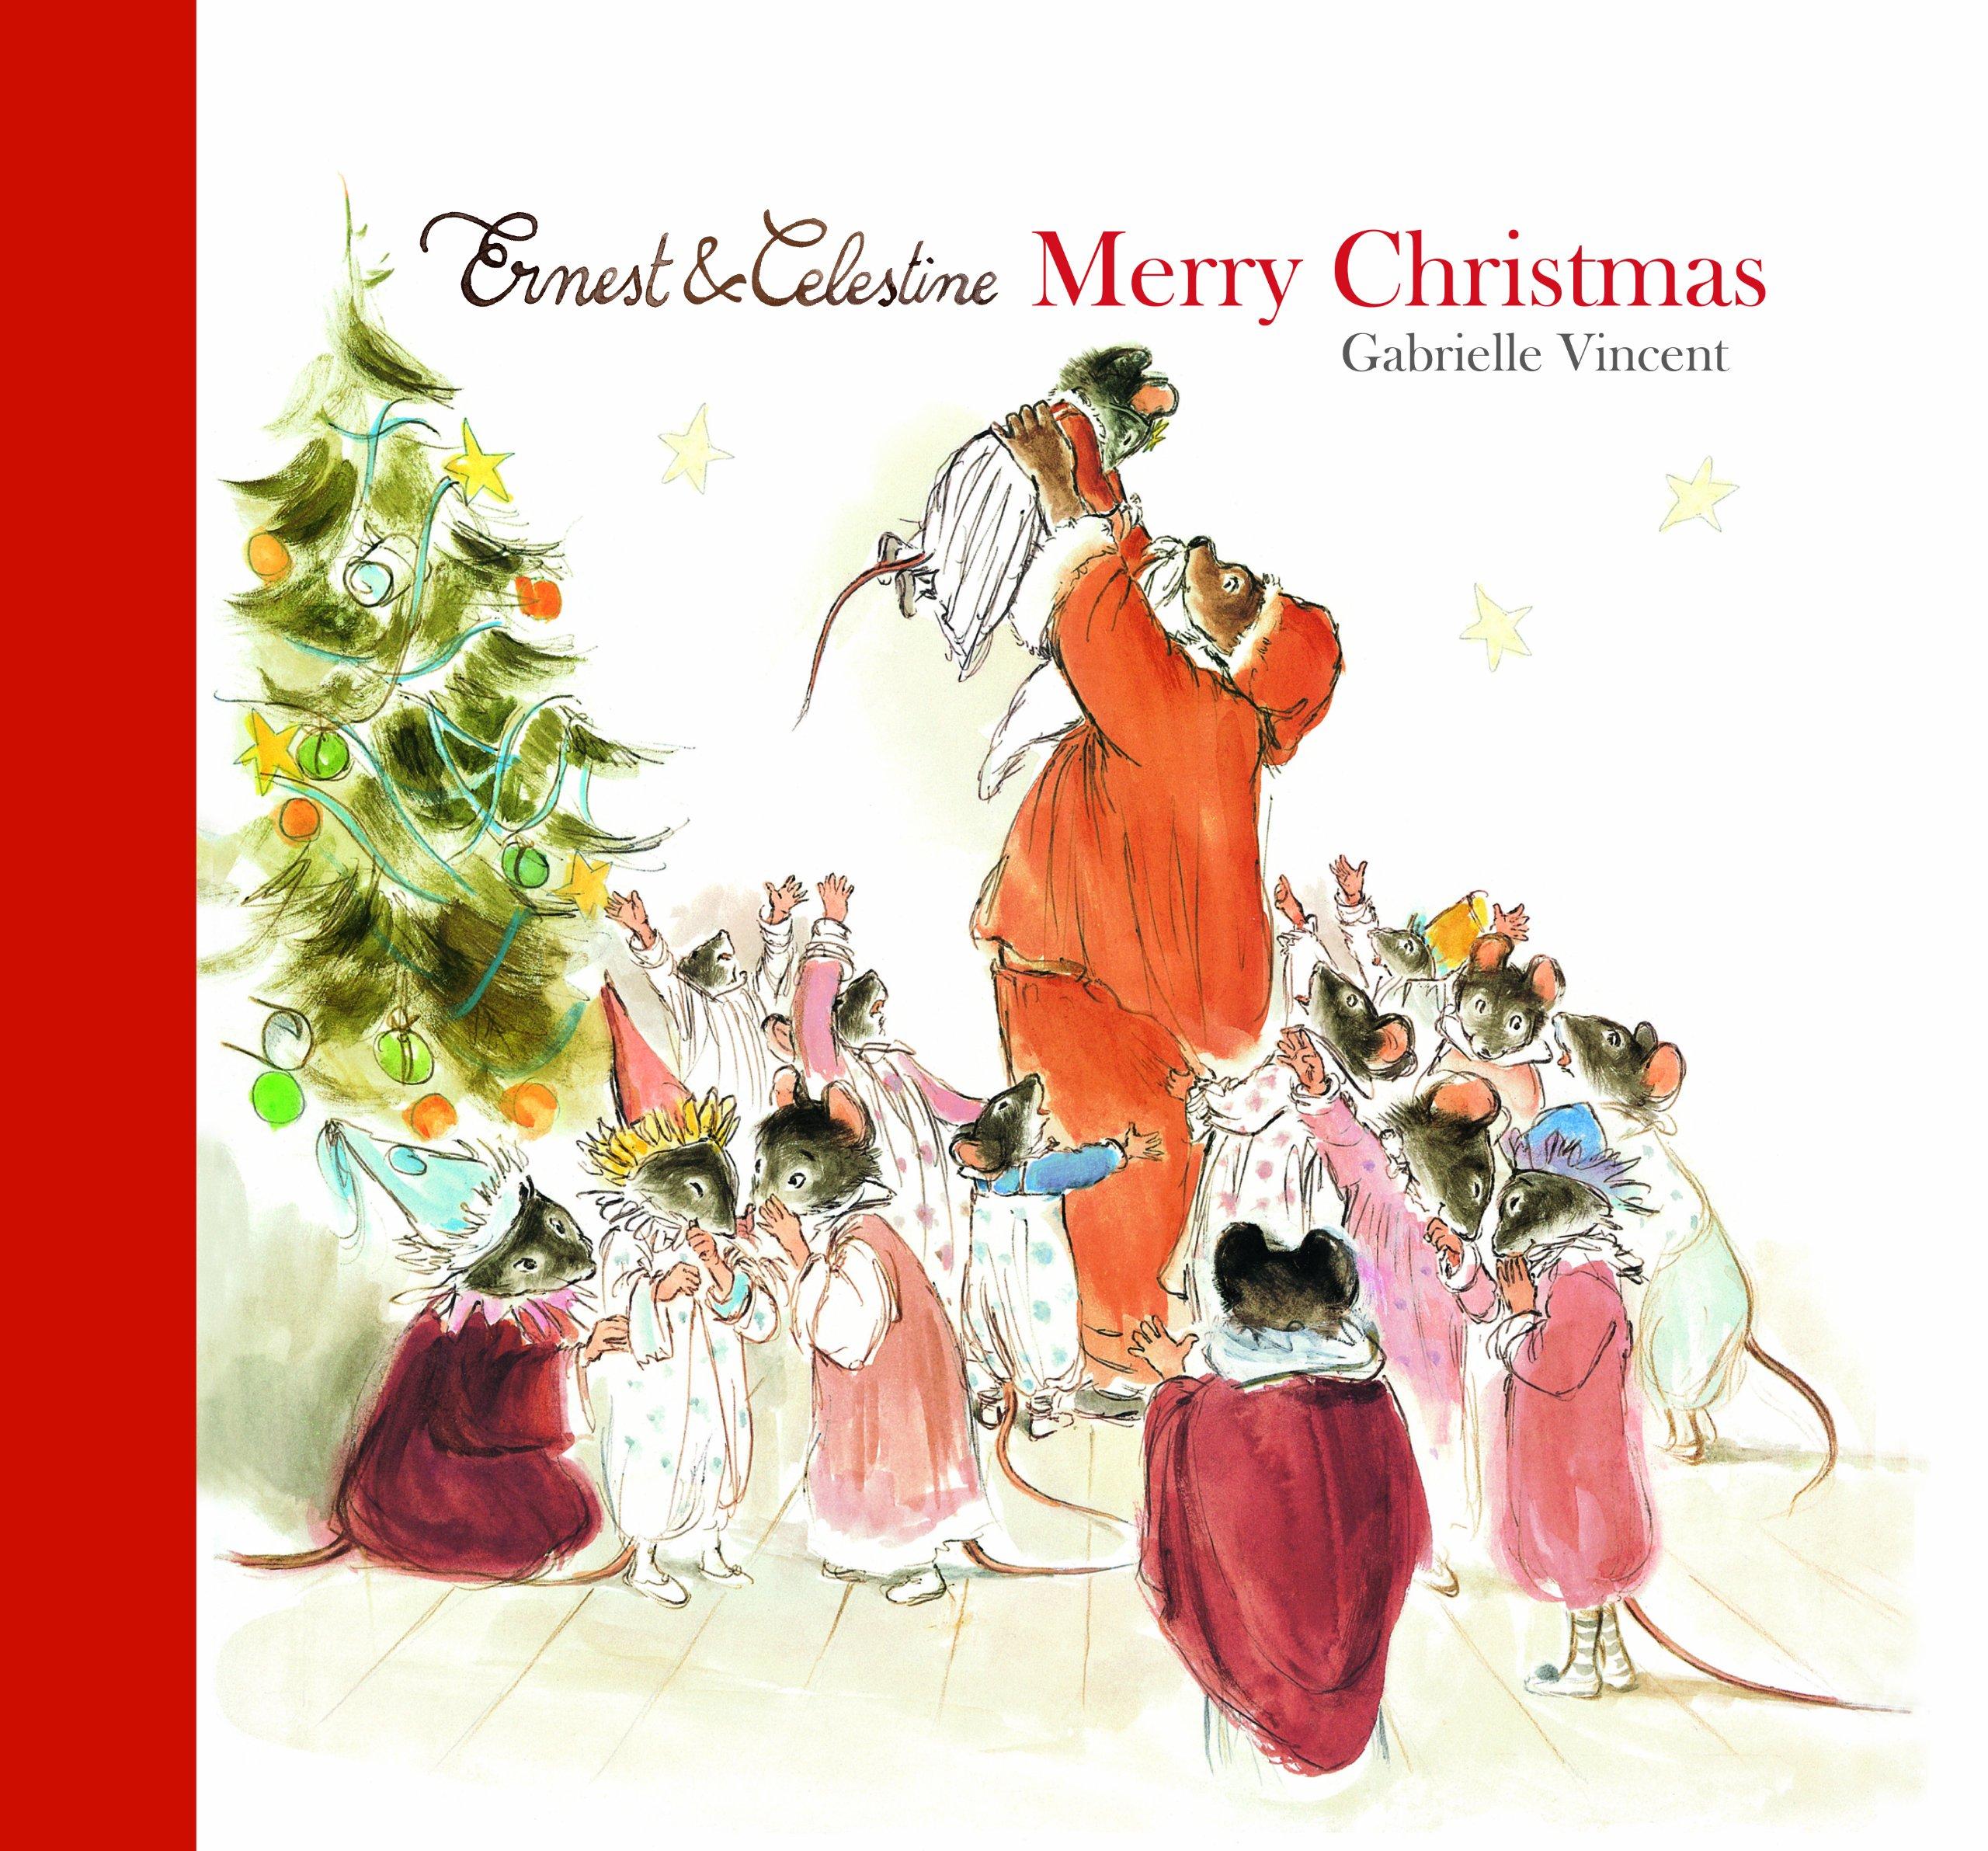 Ernest Christmas.Merry Christmas Ernest Celestine Gabrielle Vincent